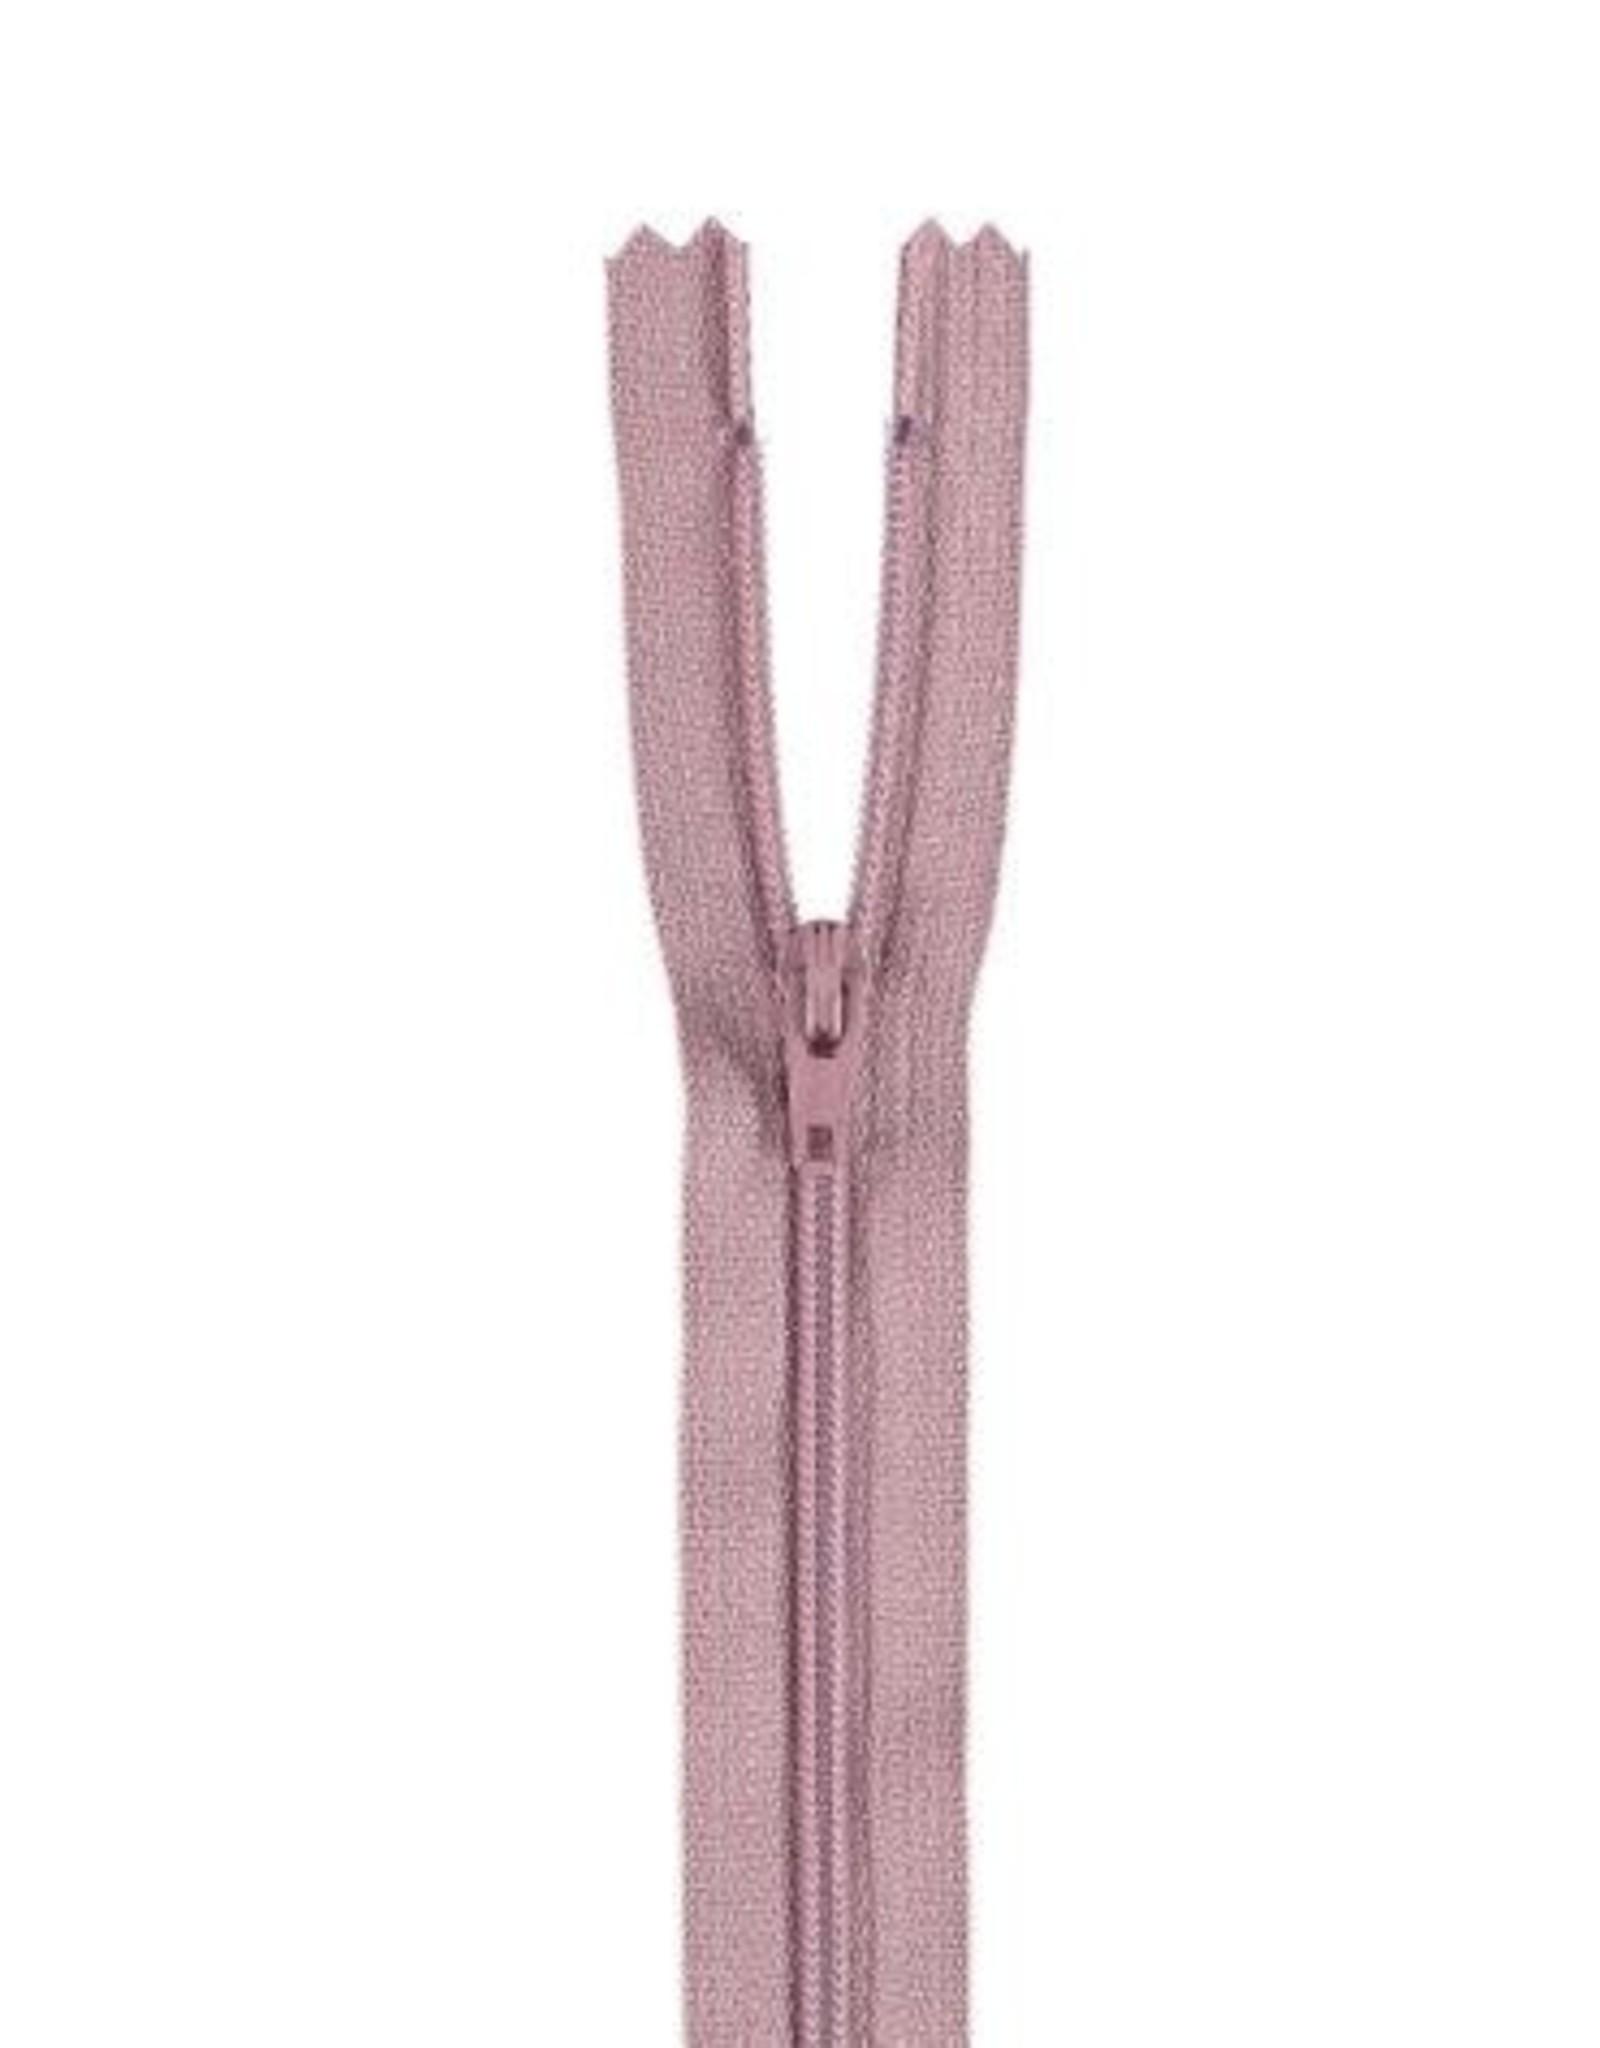 YKK Spiraalrits niet-DB 3mm oud roze 069-35cm